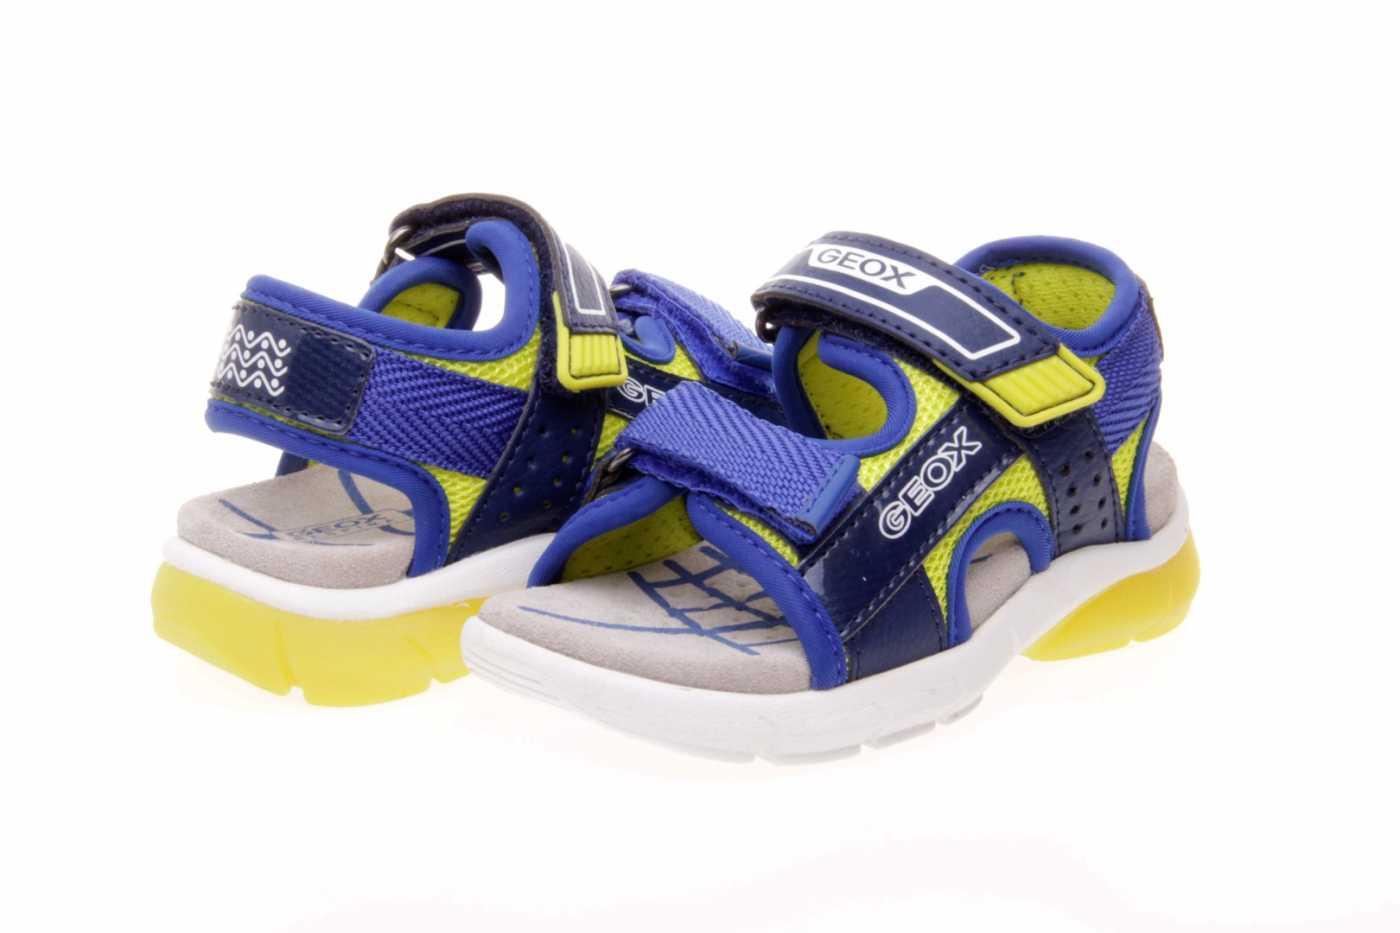 Niño Luces Sandalia Geox Con Velcro Y Doble QdsthrC